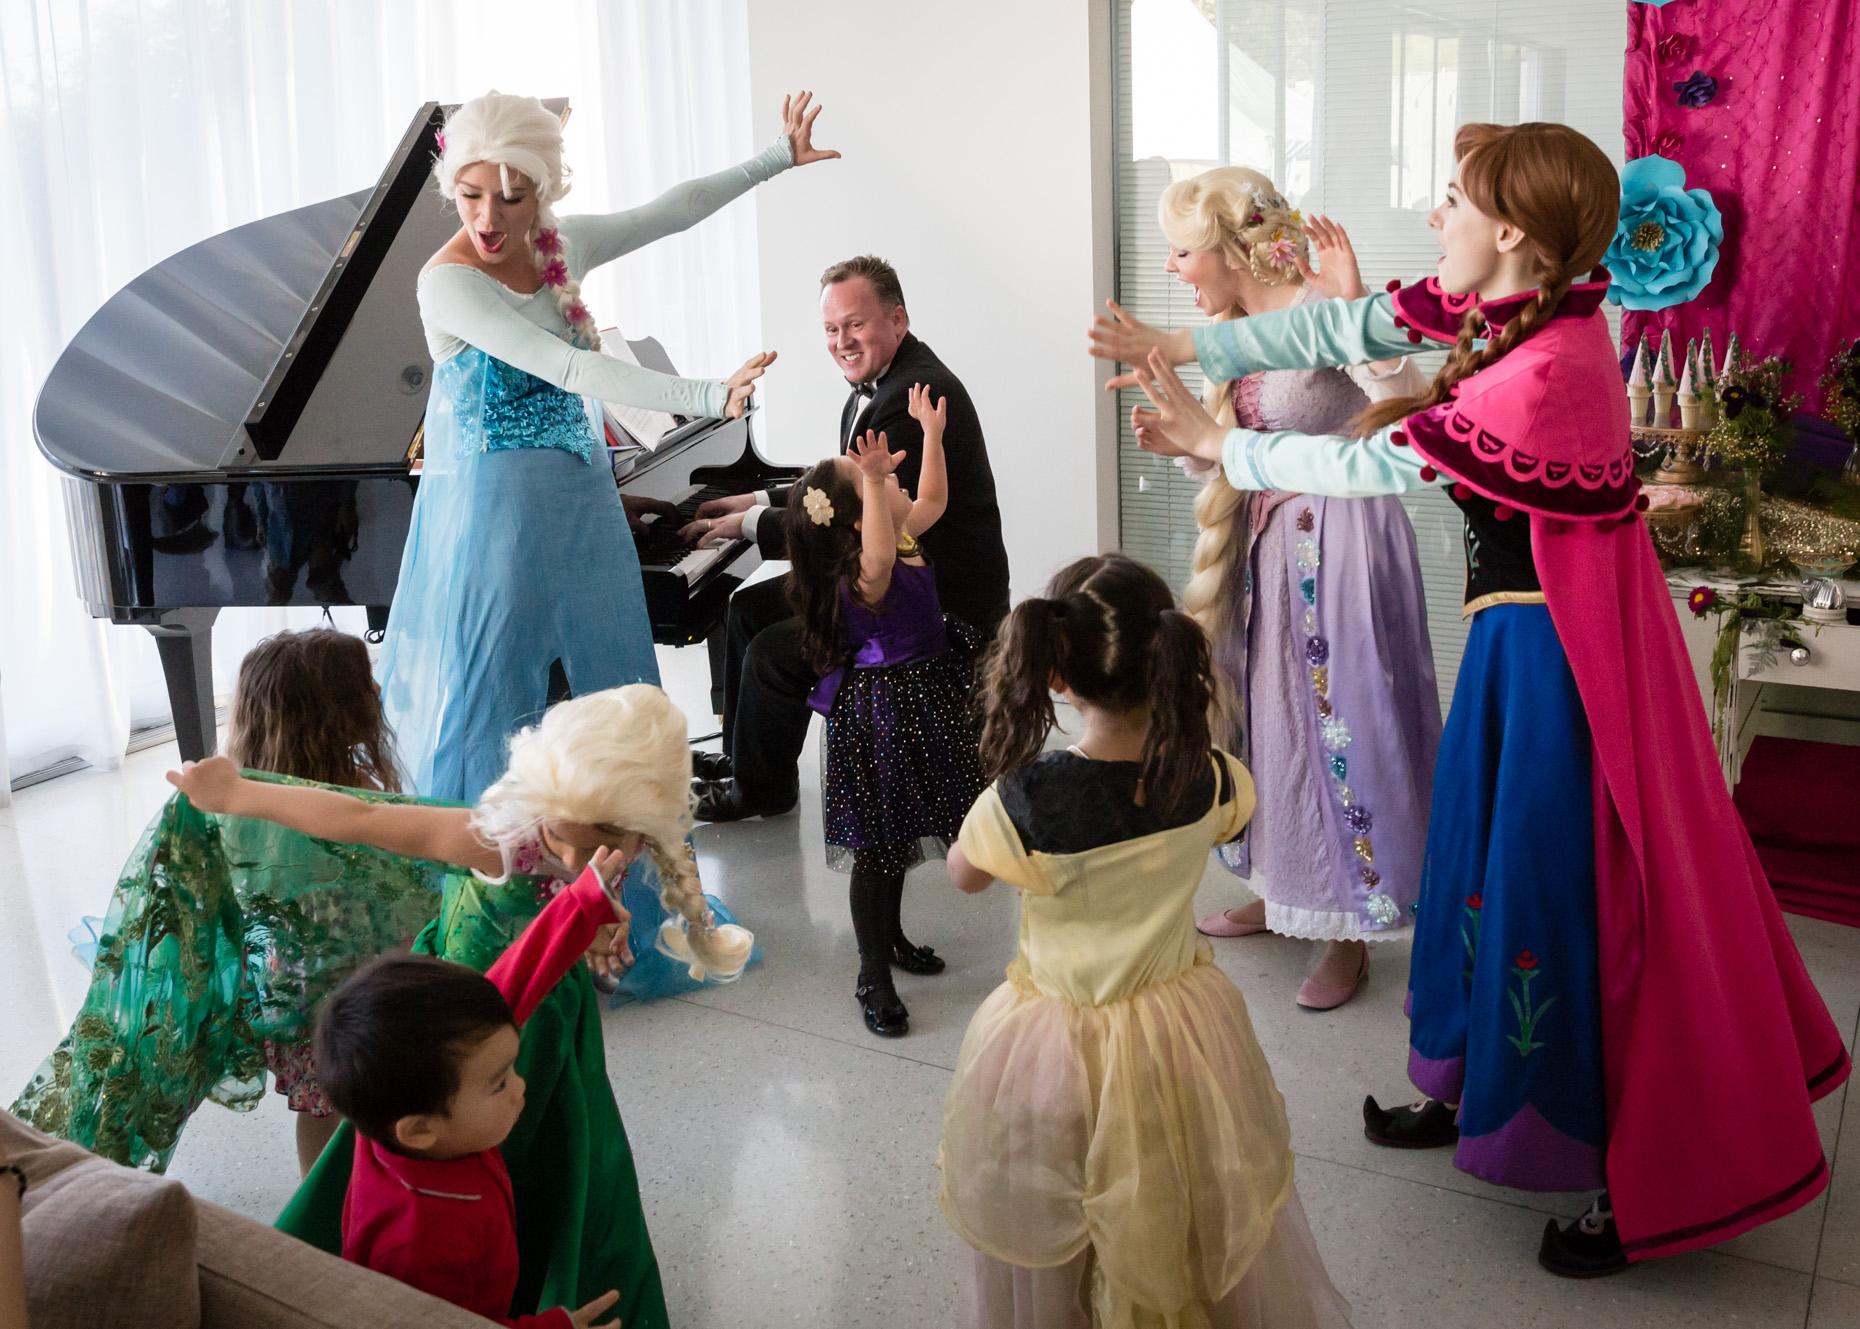 elsa anna rapunzel sing let it go chris ring pianist beverly hills party.jpg